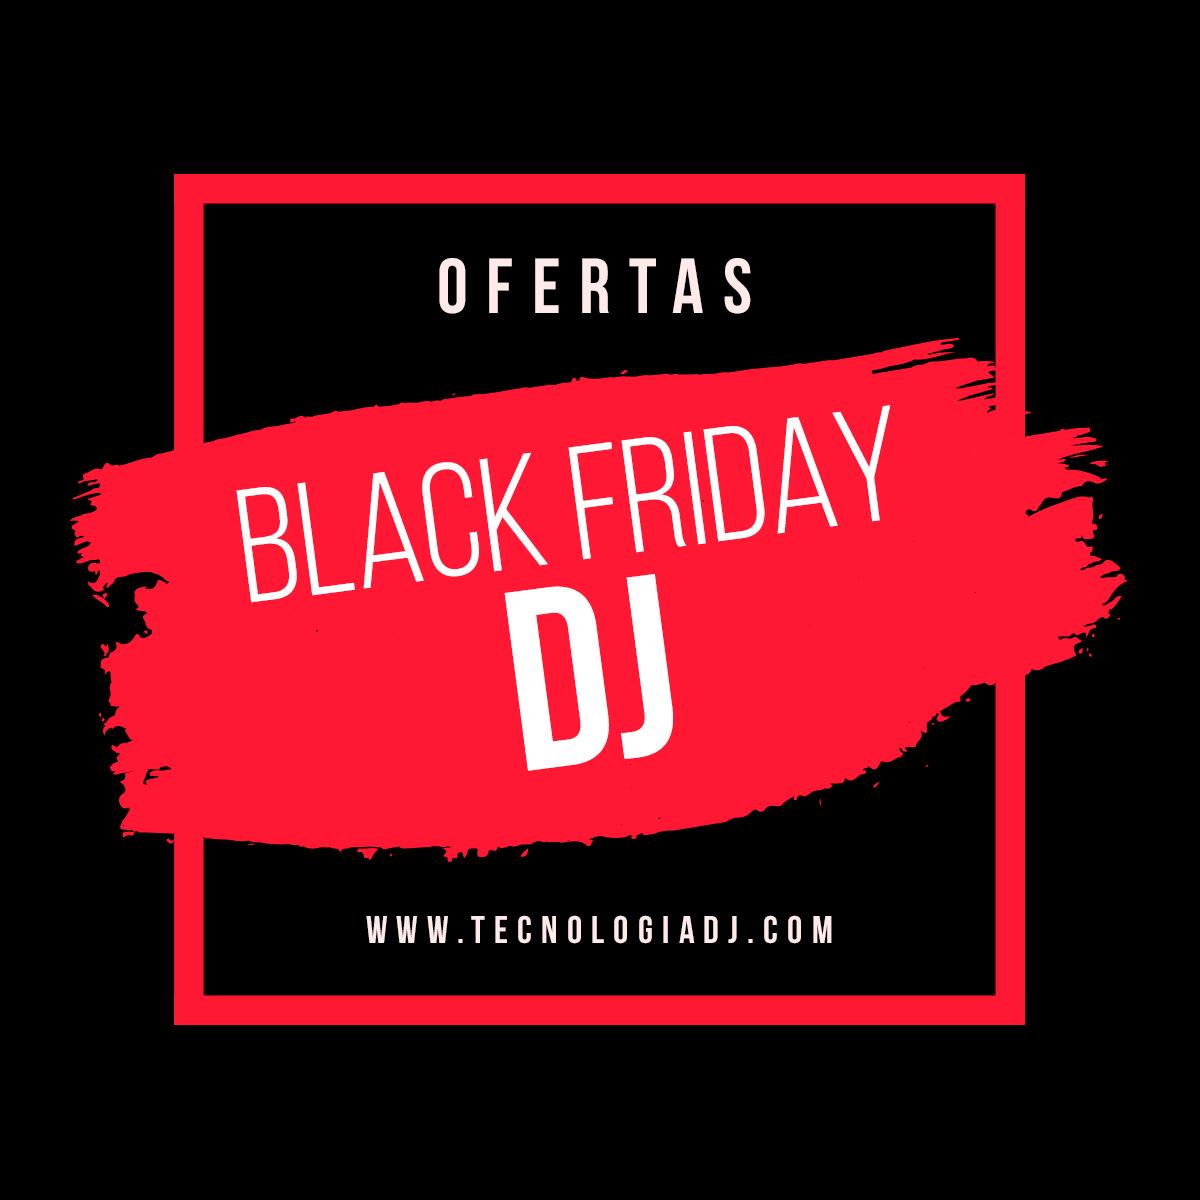 Ofertas Black Friday para DJs 2017